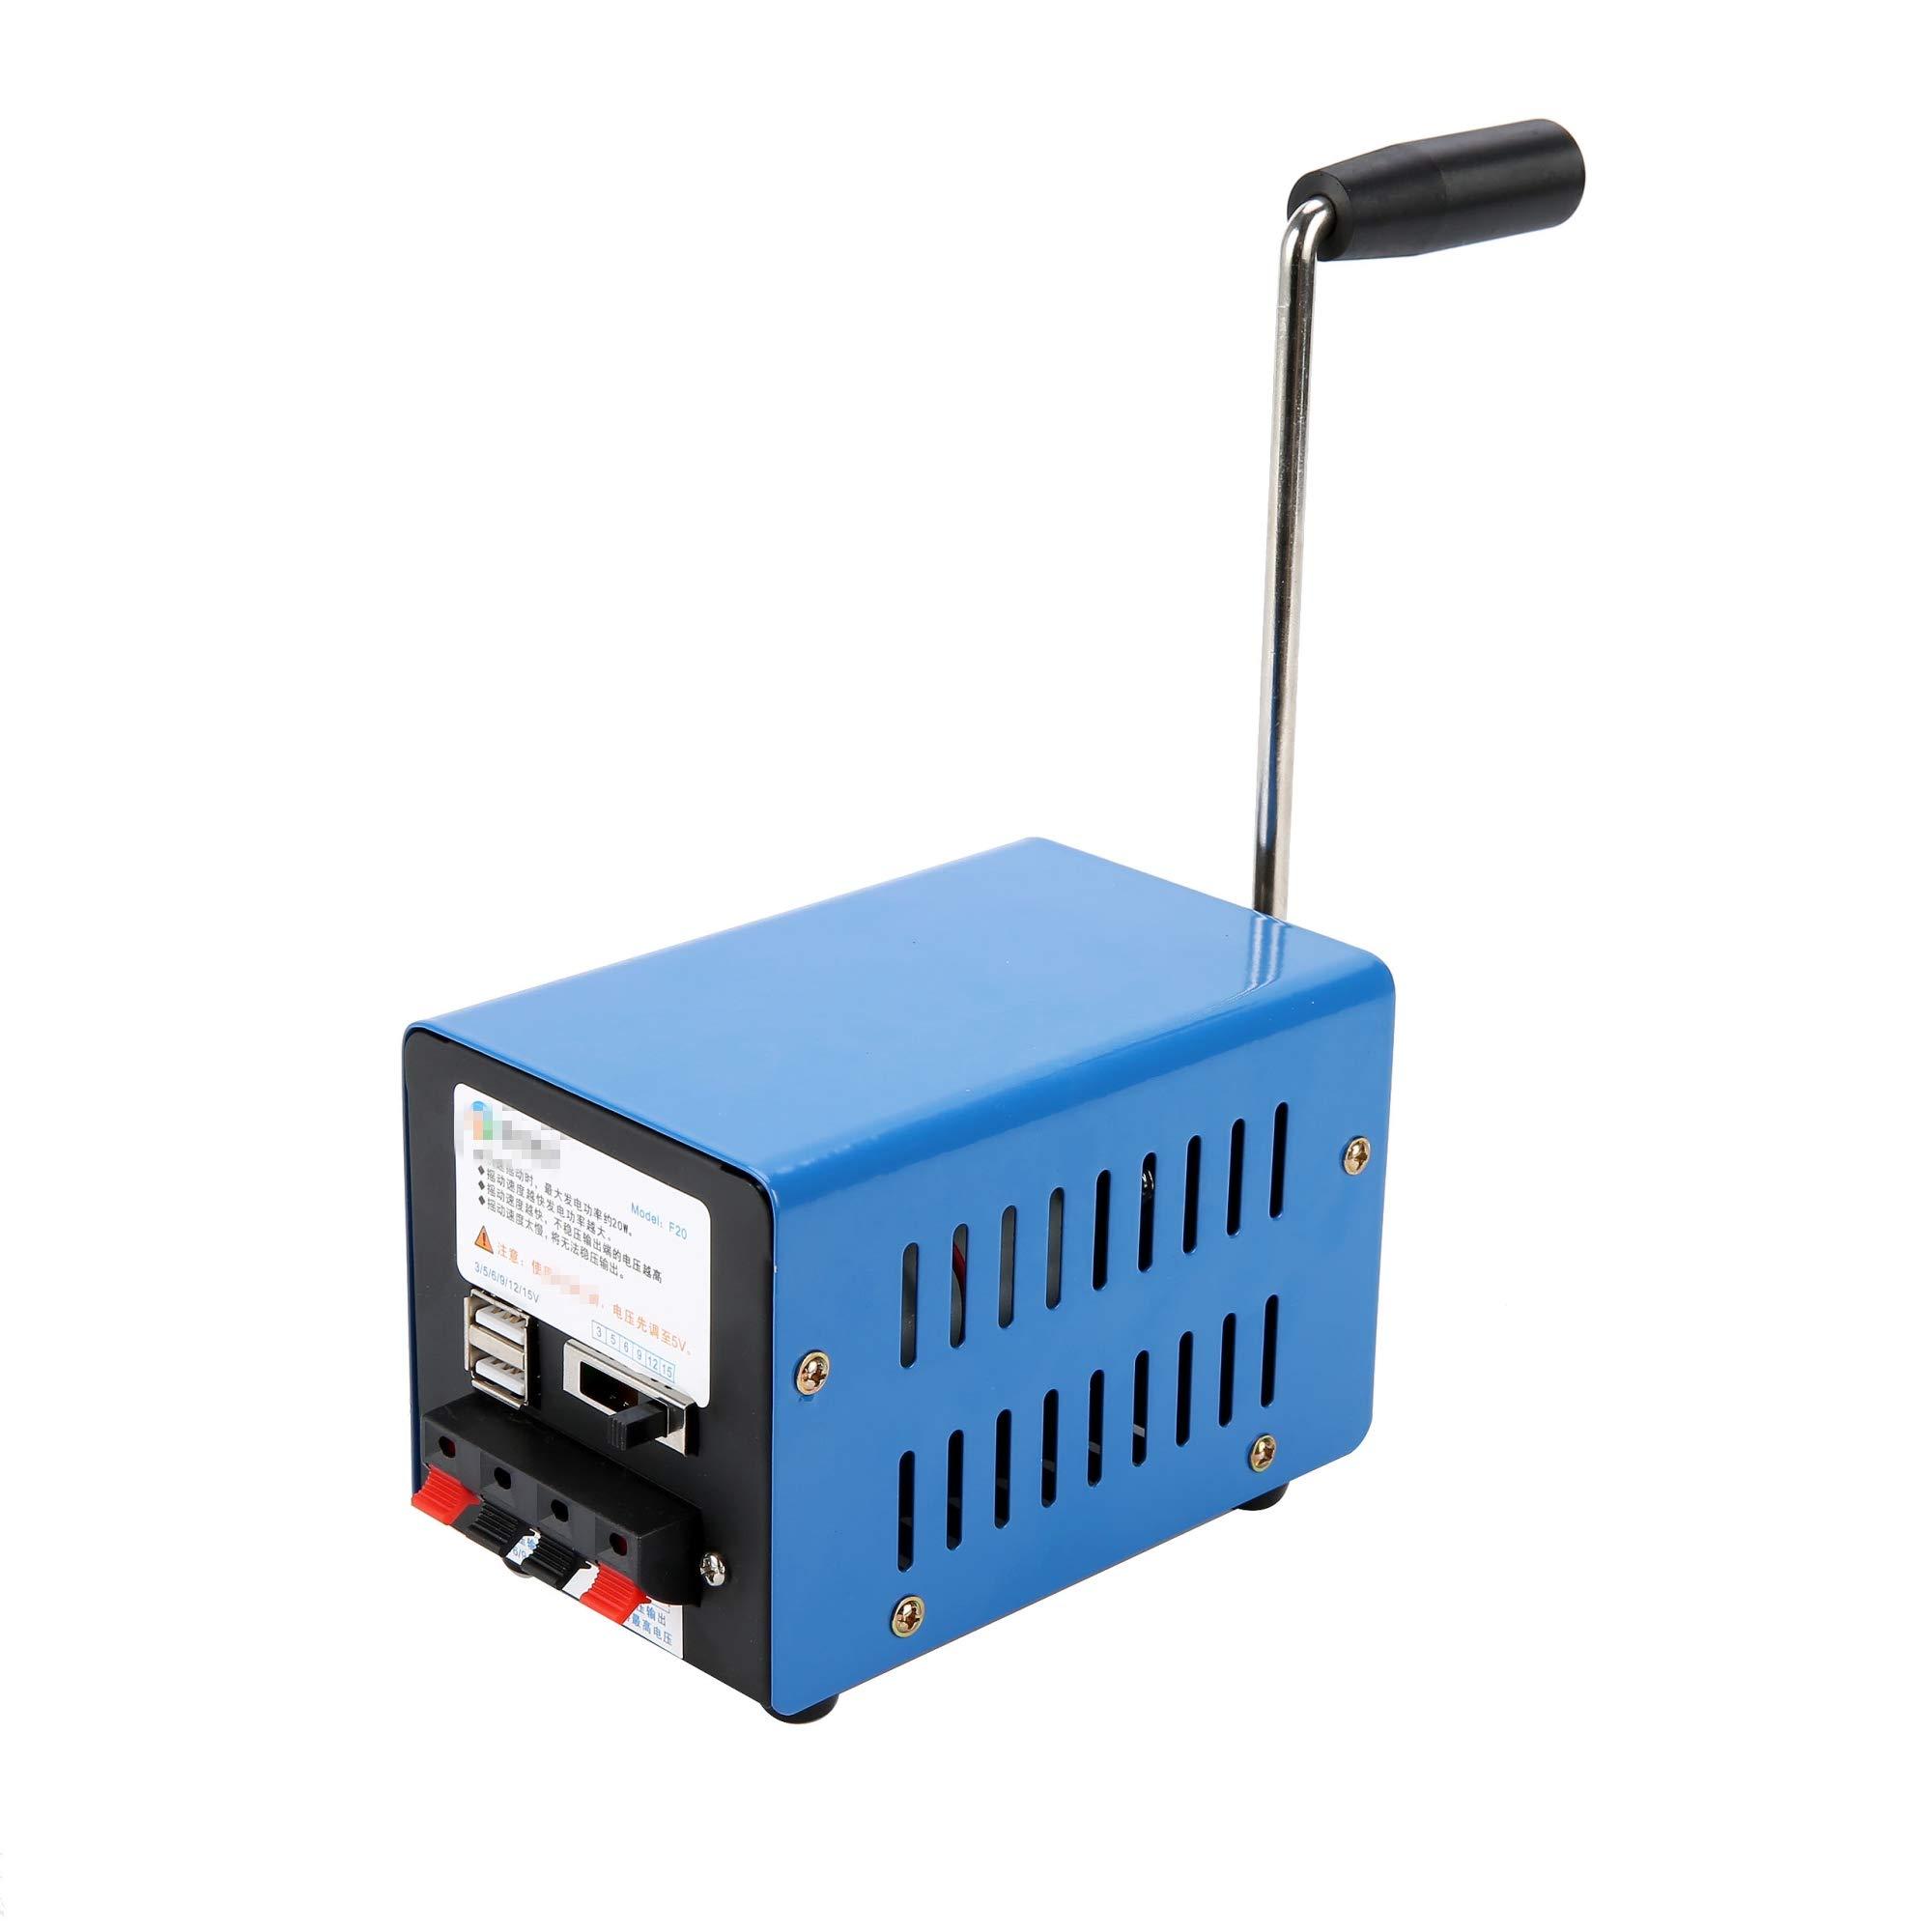 YAETEK Portable Generator Inverter Outdoor Multifunction Manual Crank Generator for Emergency Survival